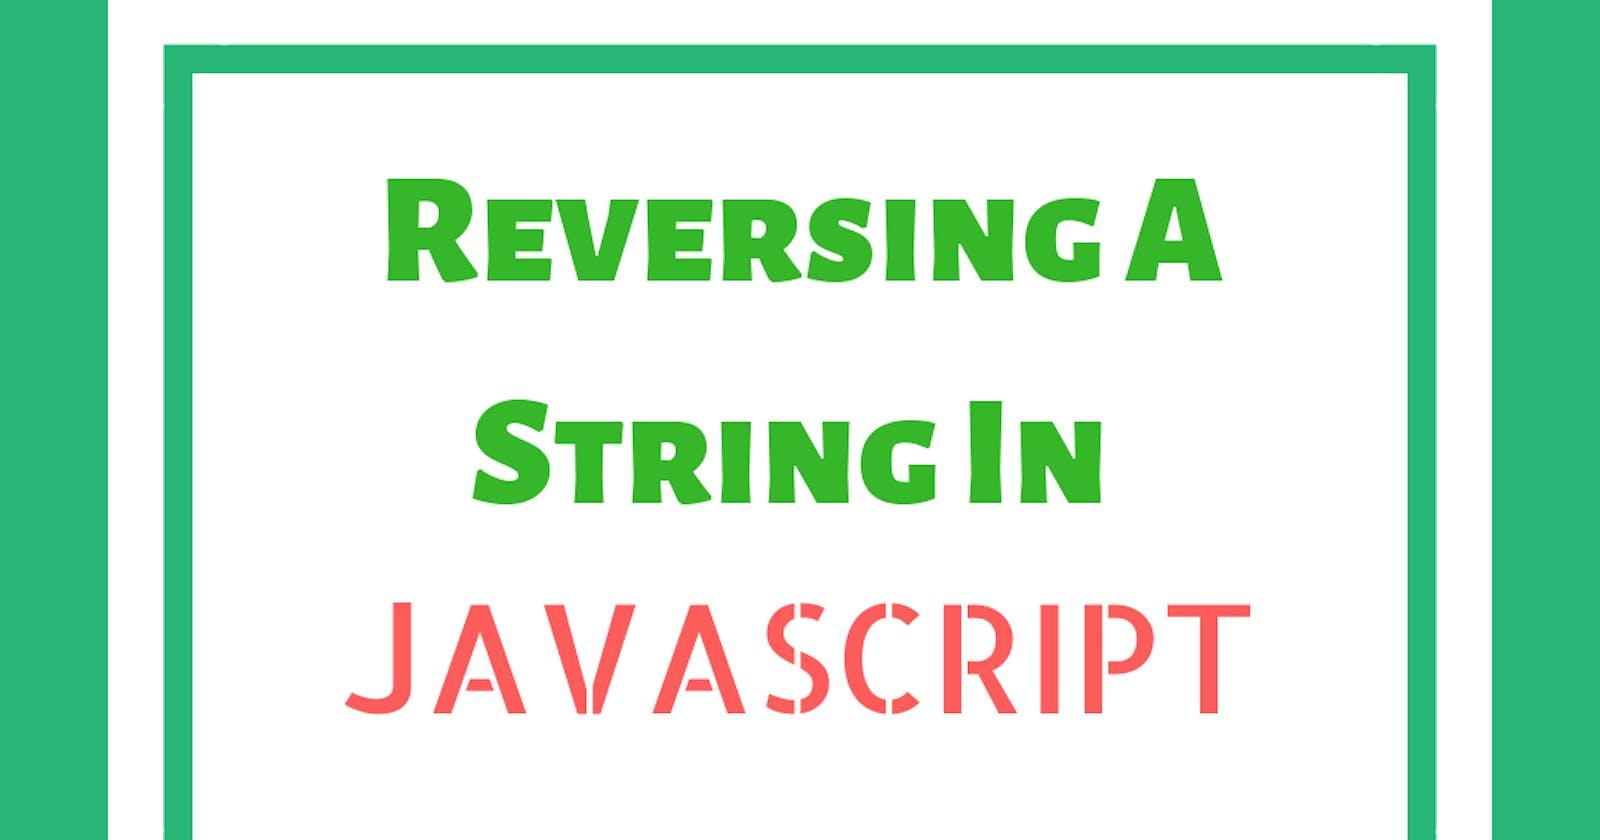 Reversing a String in Javascript